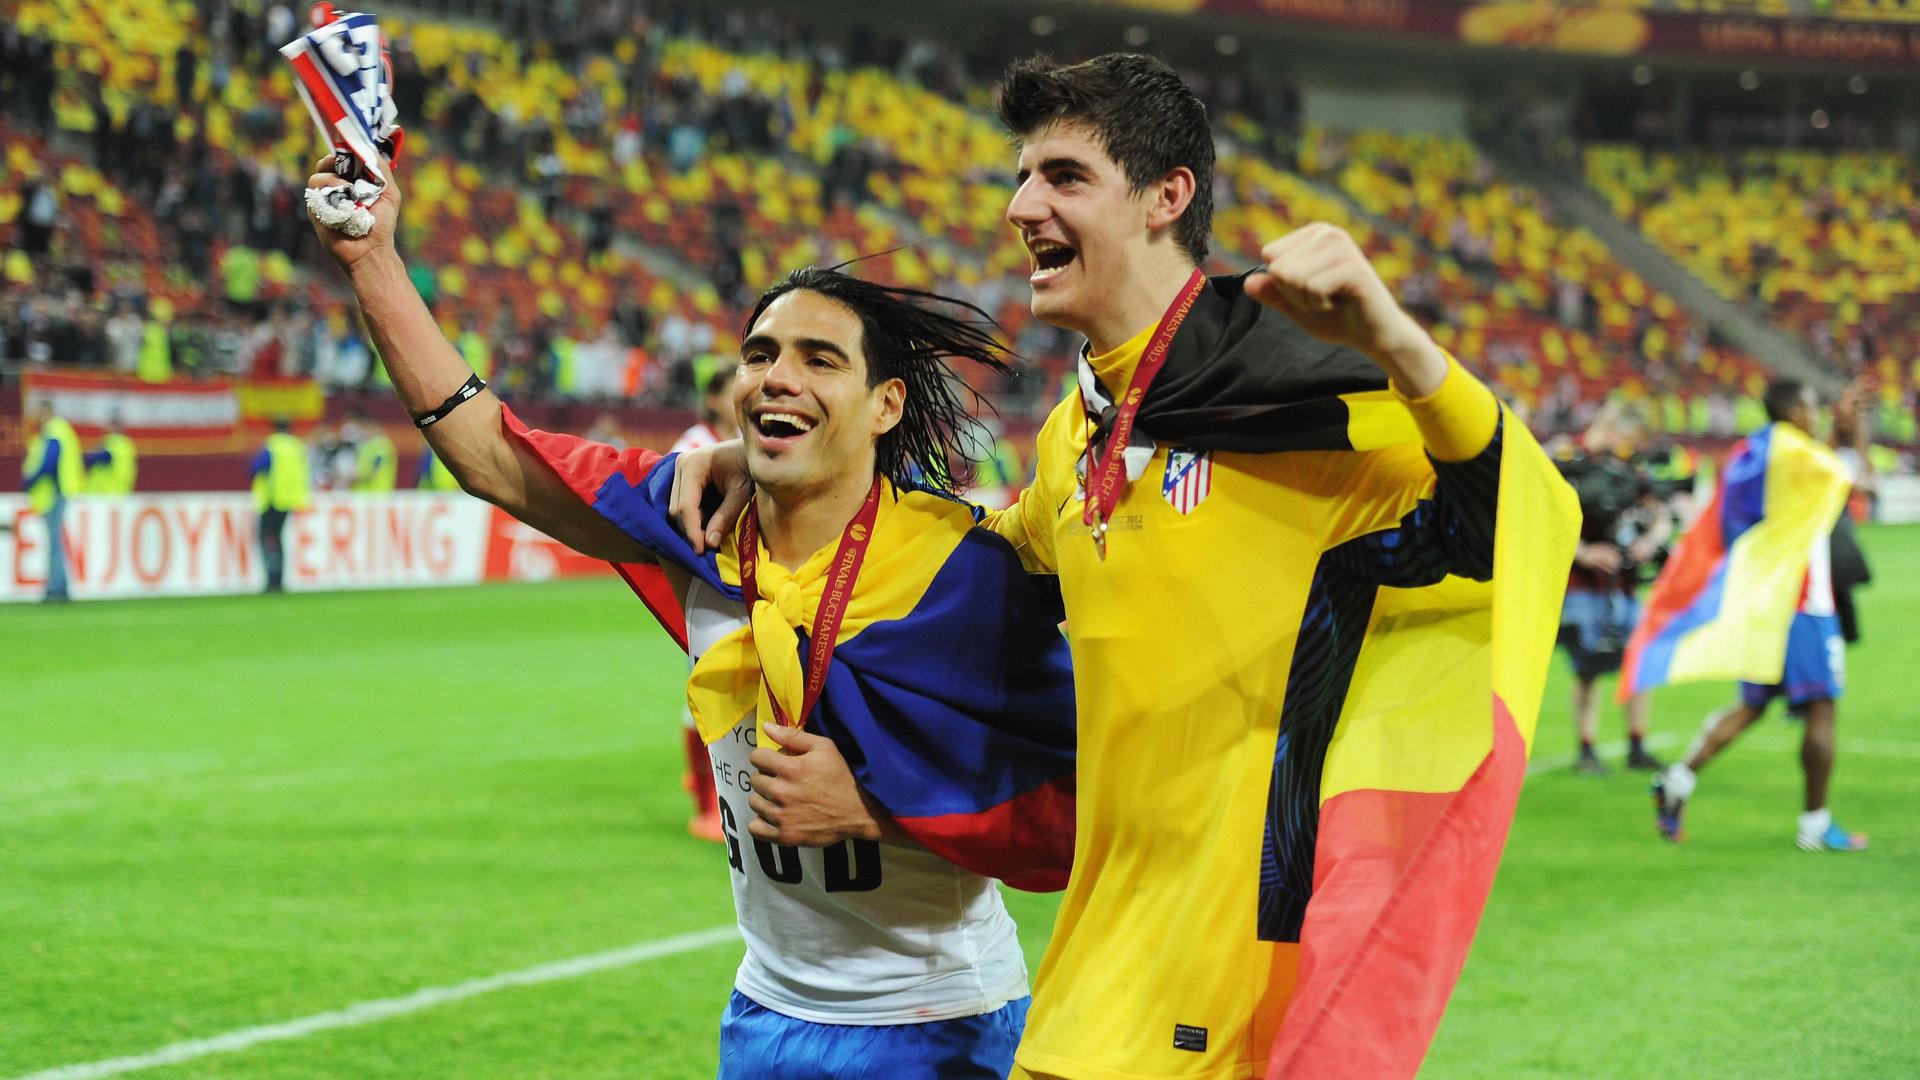 Radamel Falcao Thibaut Courtois Atletico Madrid